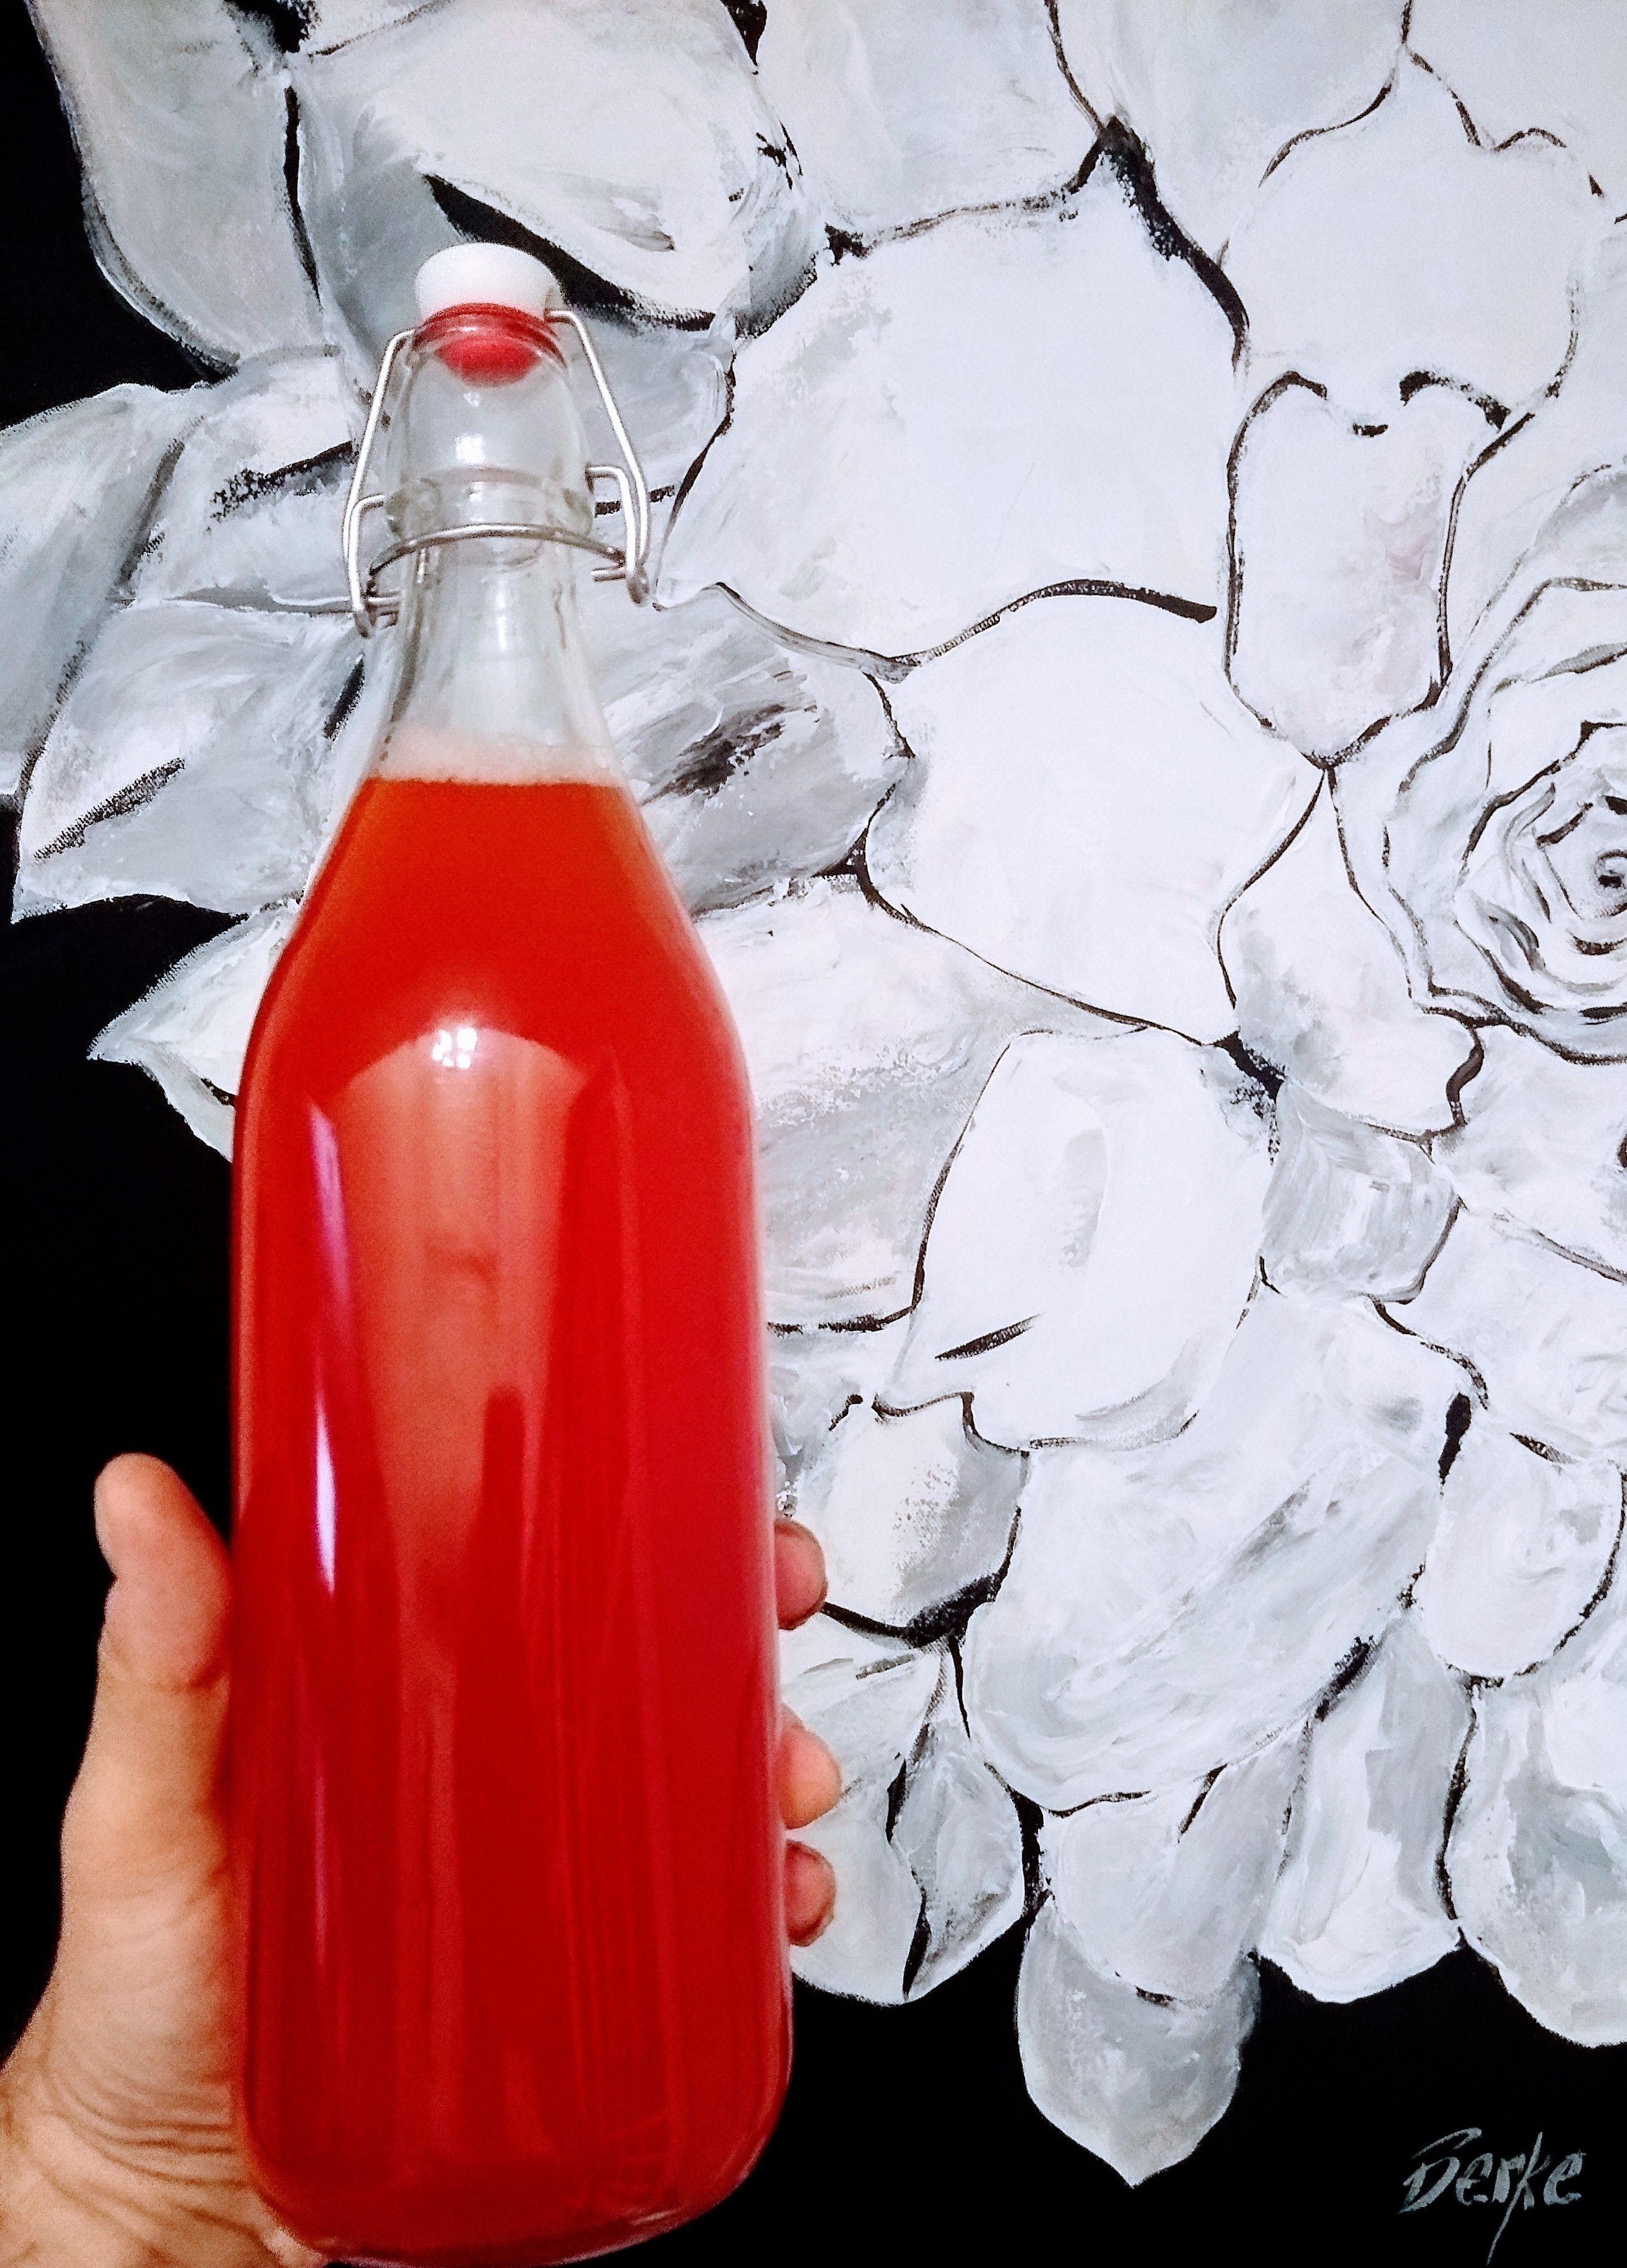 Sparkling Strawberry Lemonade - Insane in the Brine